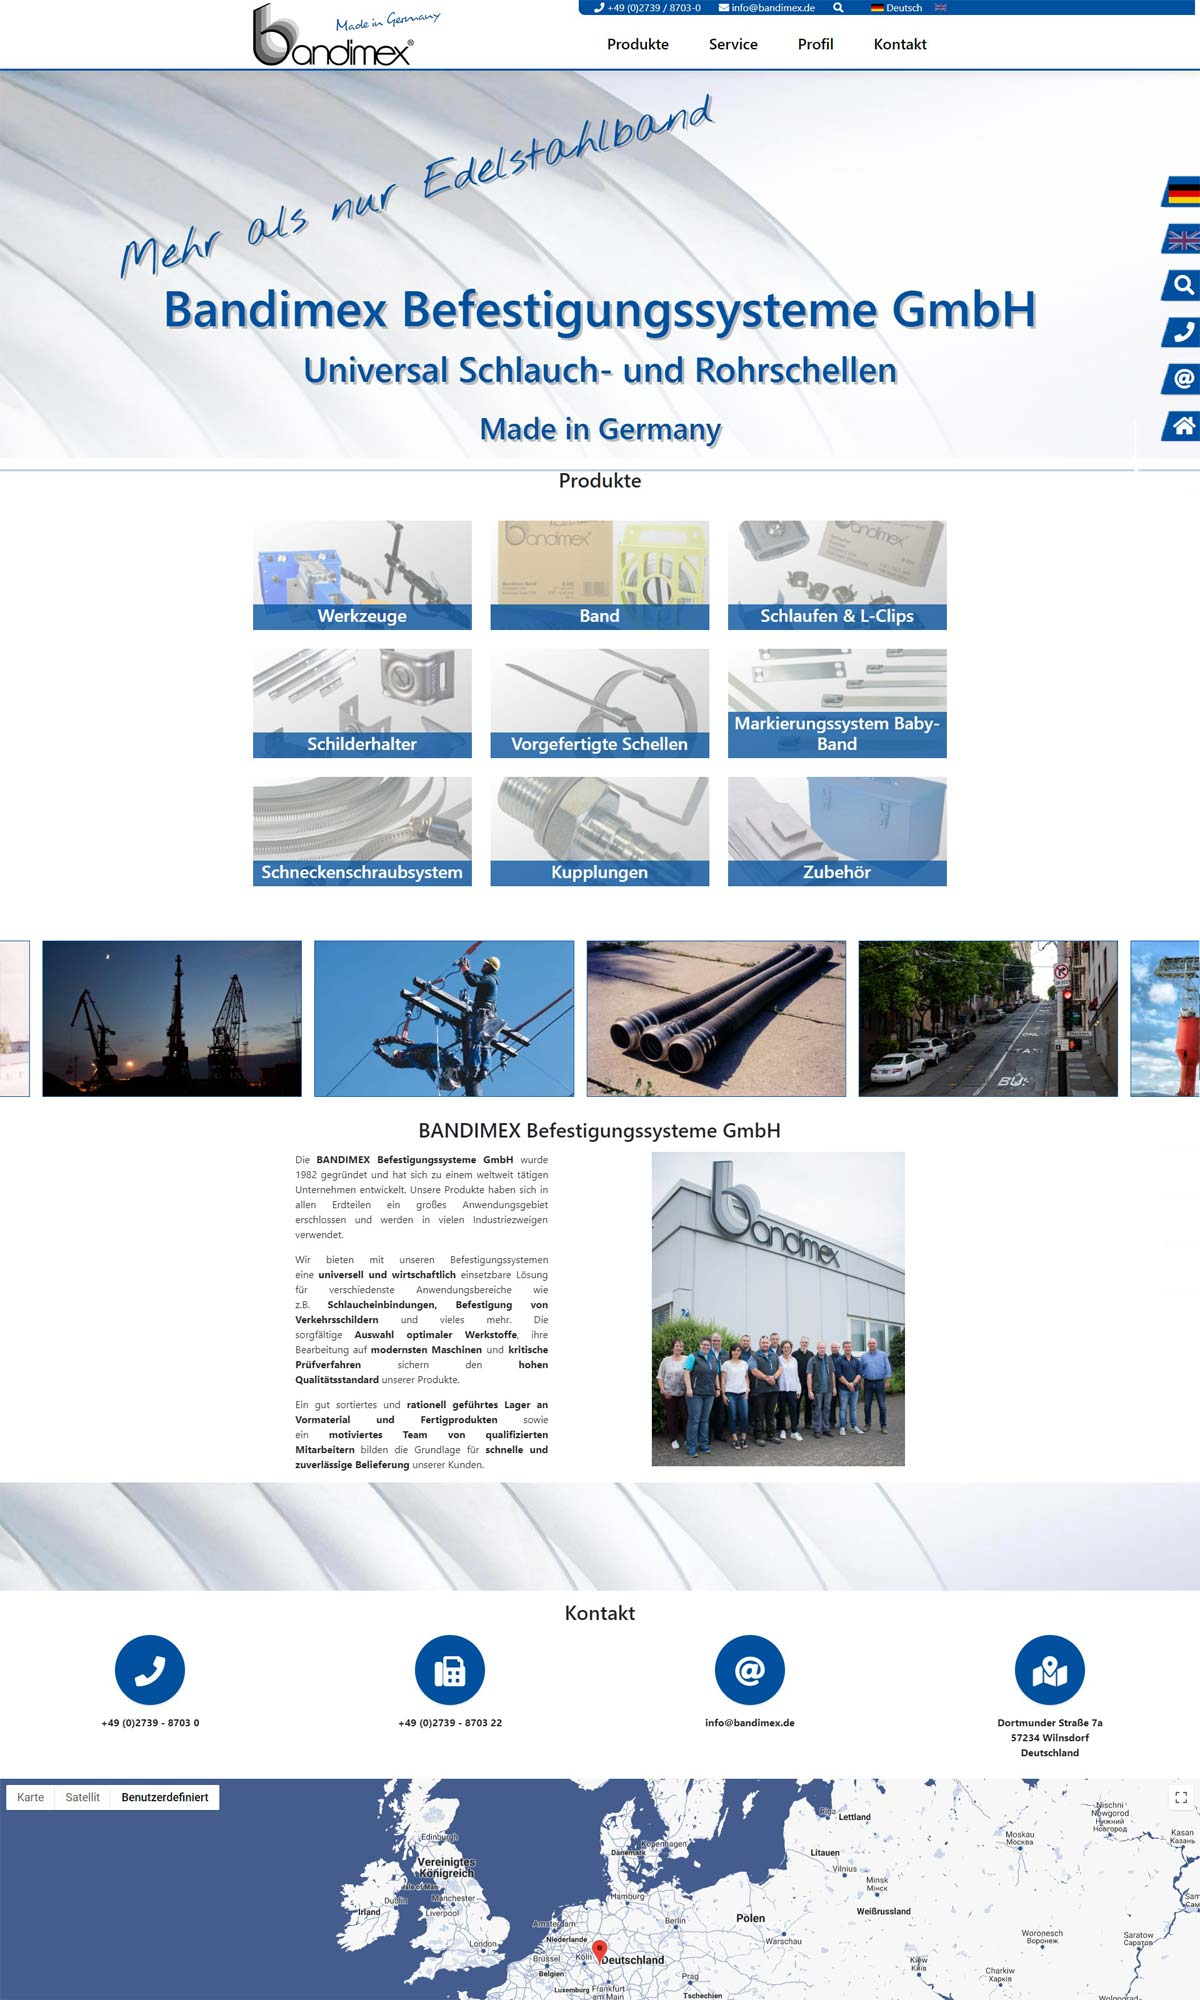 Screenshot Bandimex Befestigungssysteme GmbH